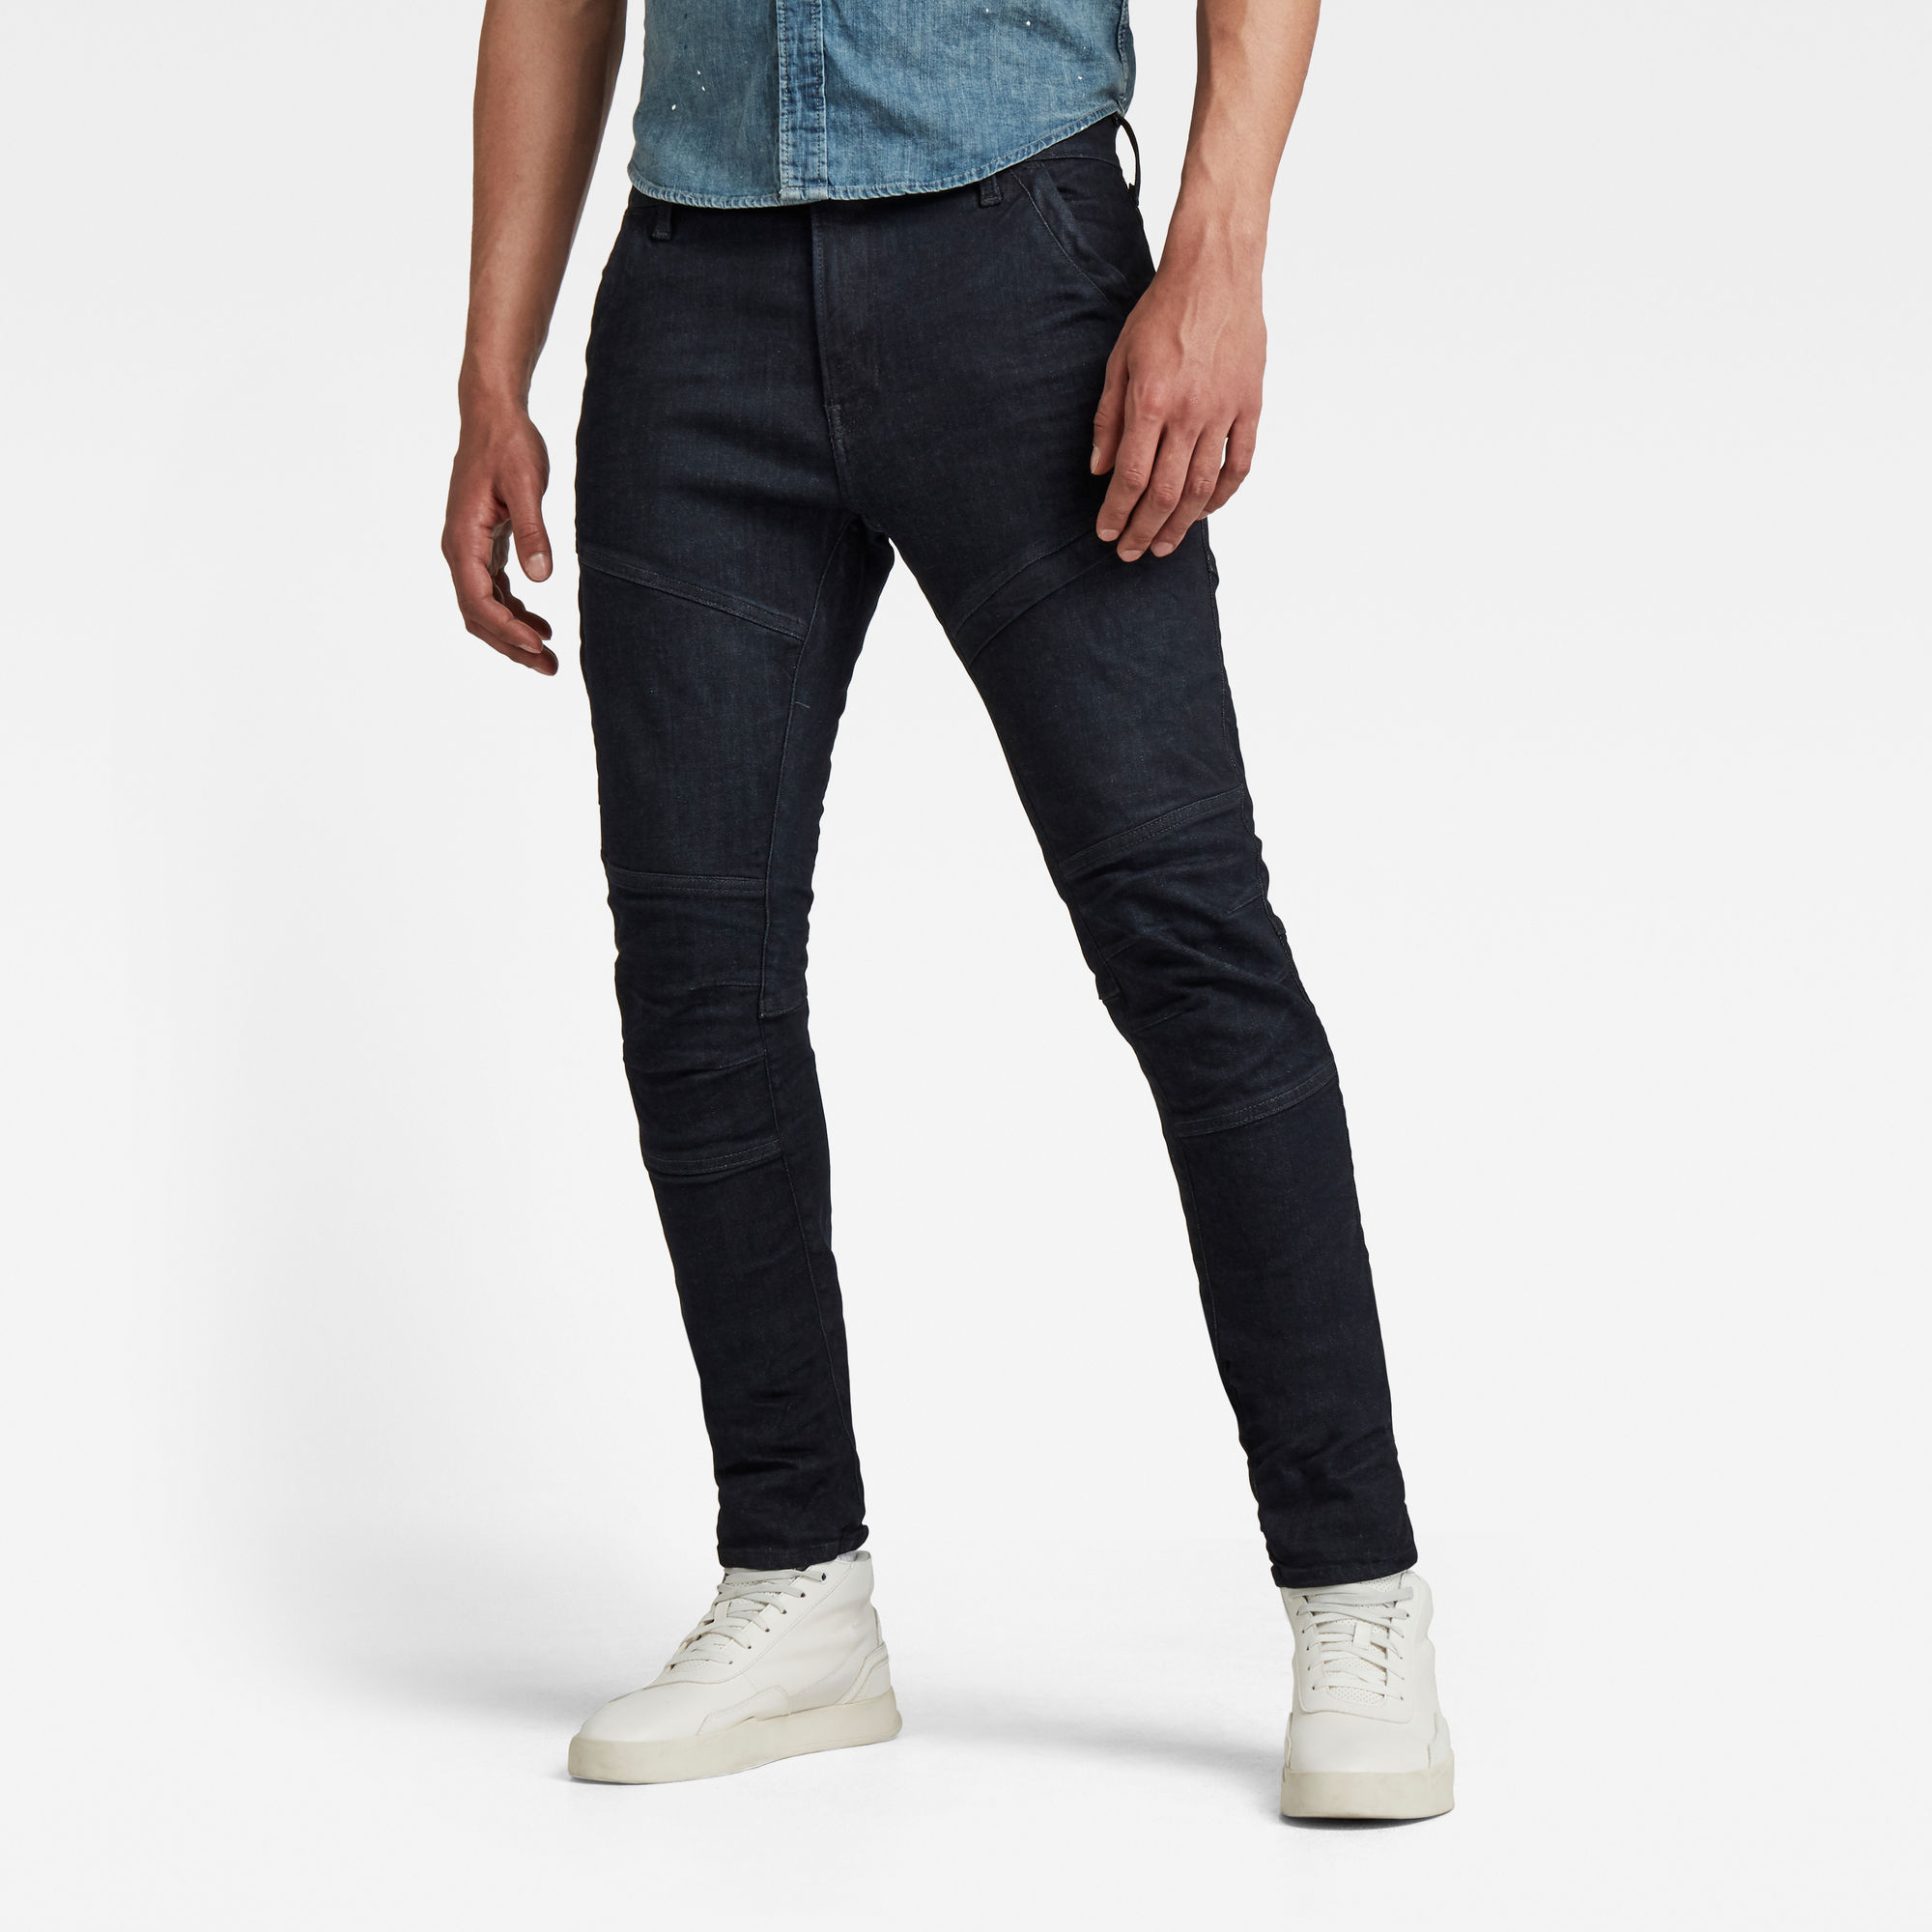 G-Star RAW Heren Rackam 3D Skinny Jeans Donkerblauw